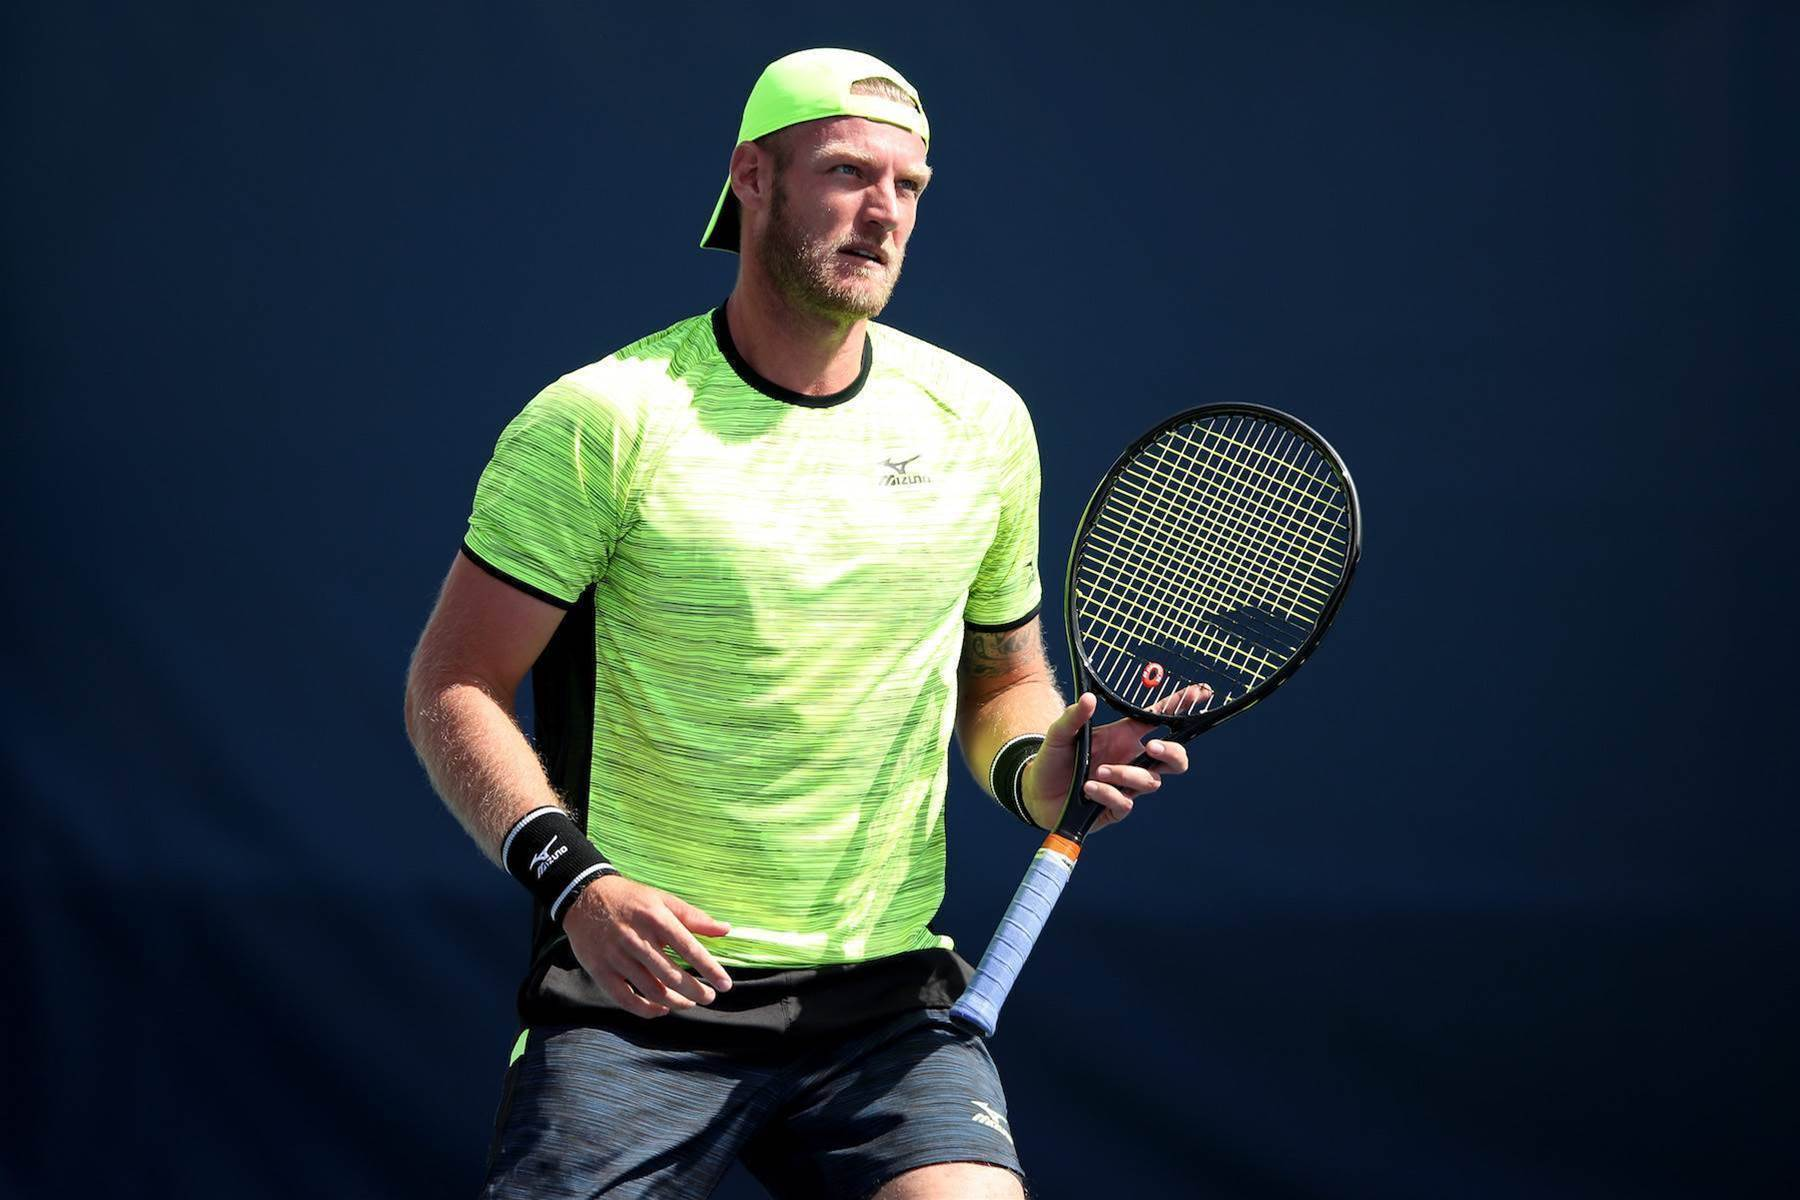 Aussie tennis star confirms retirement after Aus Open